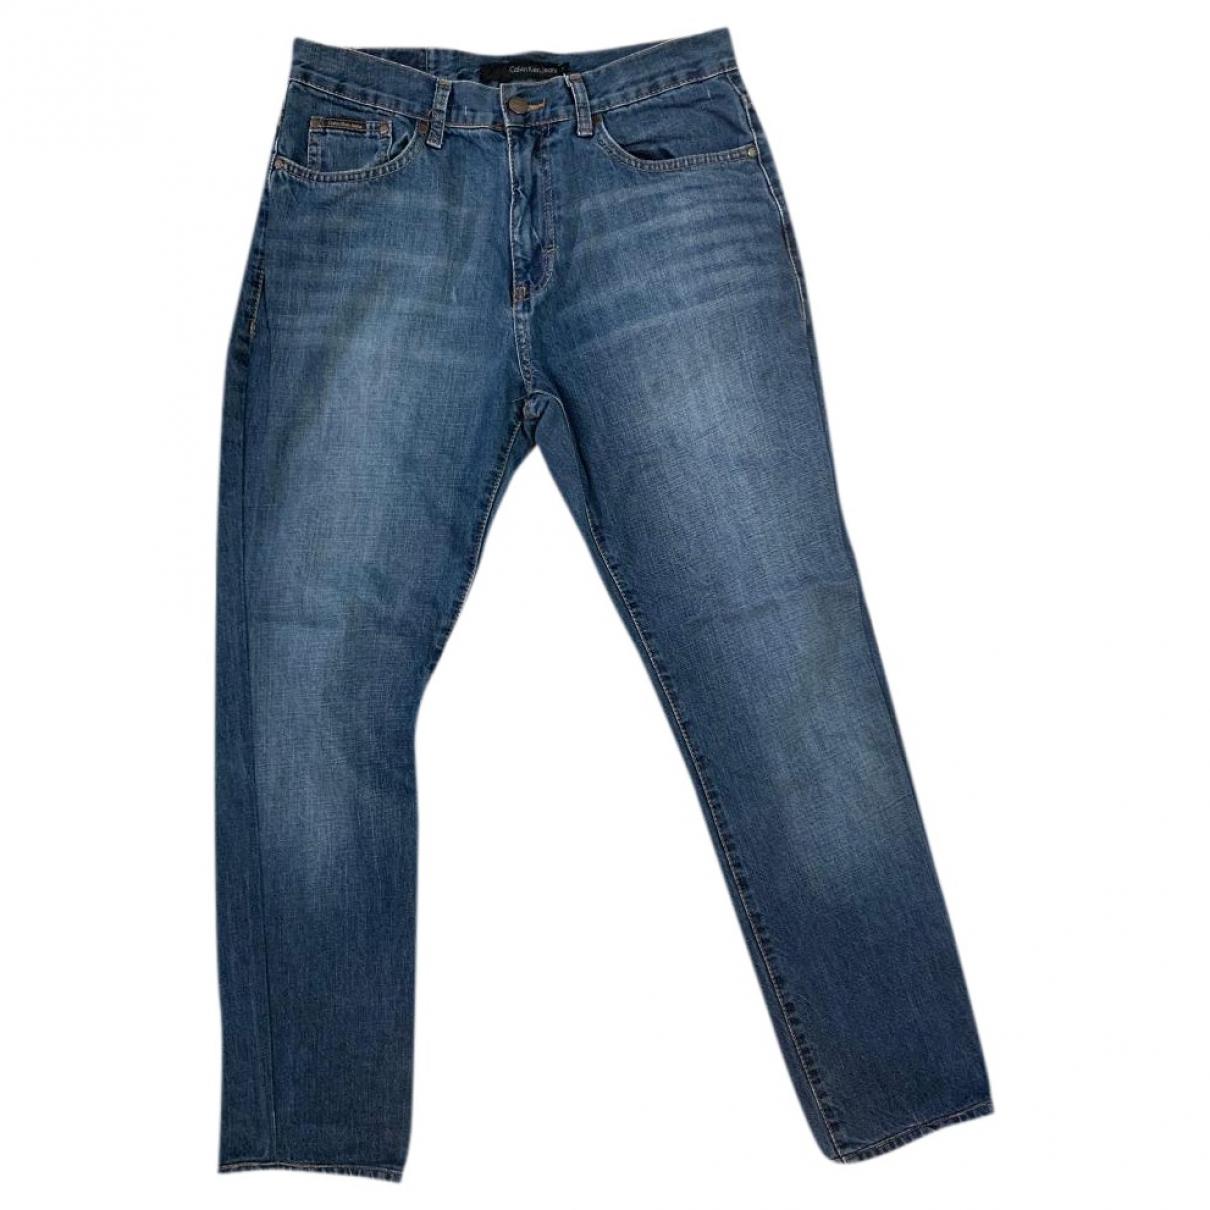 Calvin Klein \N Denim - Jeans Jeans for Women 30 US